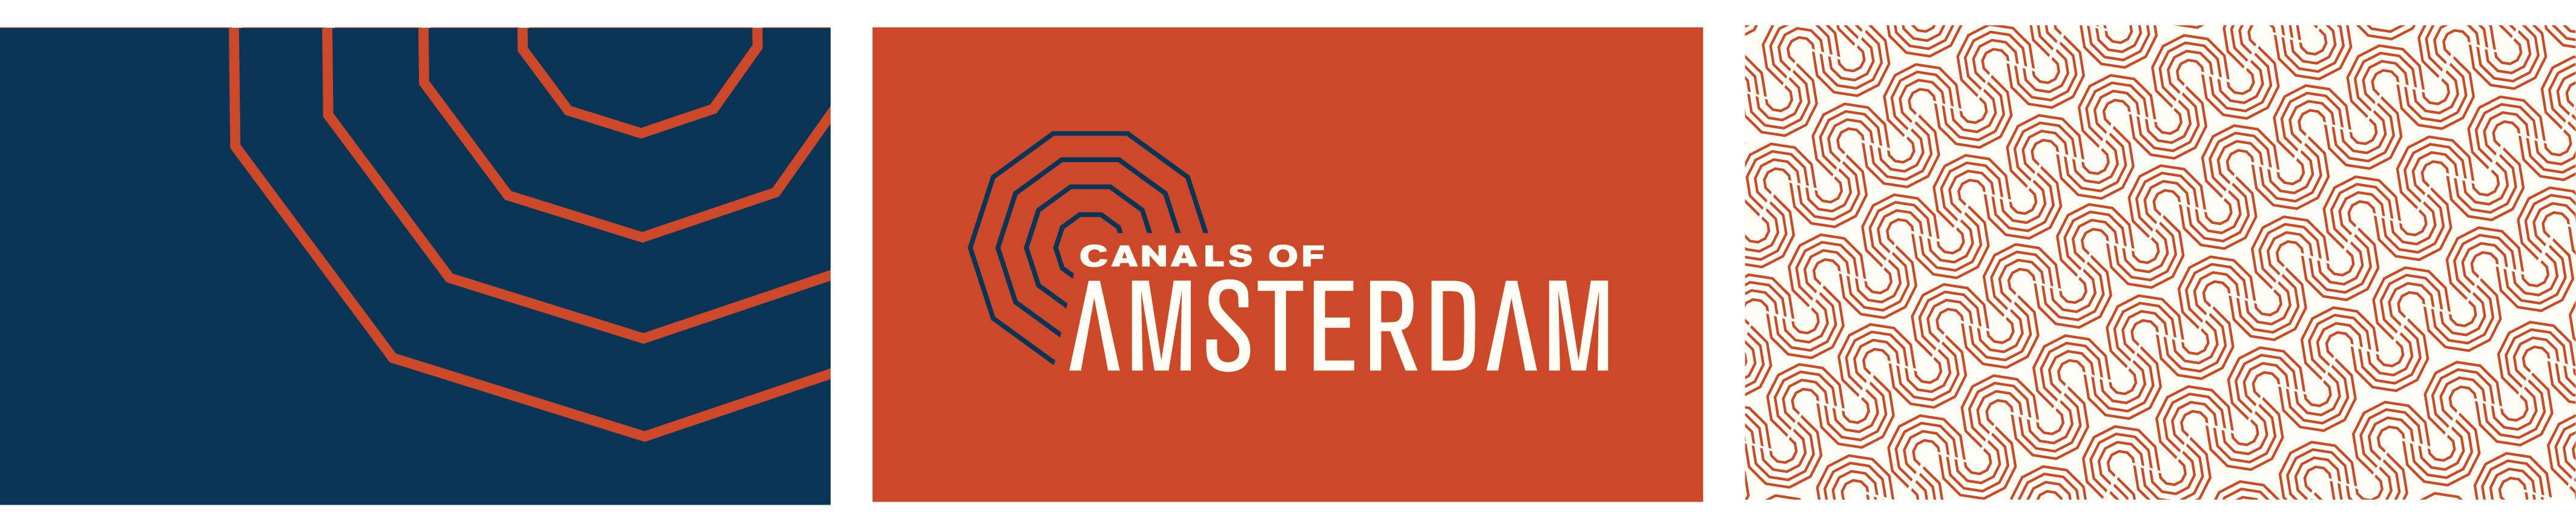 Amsterdam_TriColorHeader-06